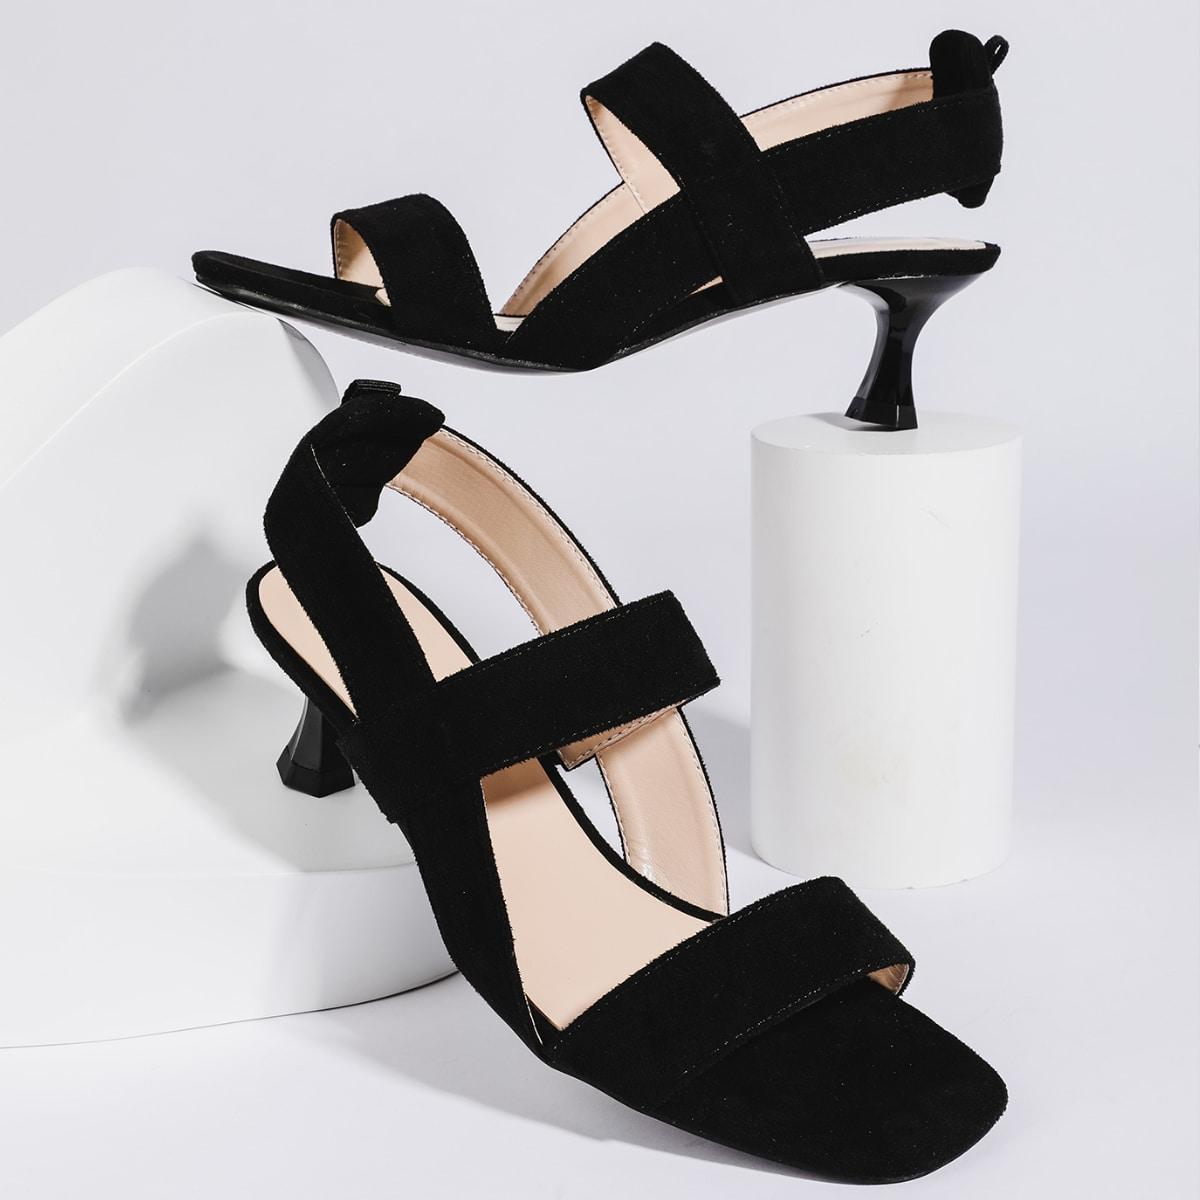 SHEIN / Open Toe Spool Heeled Slingback Suede Sandals